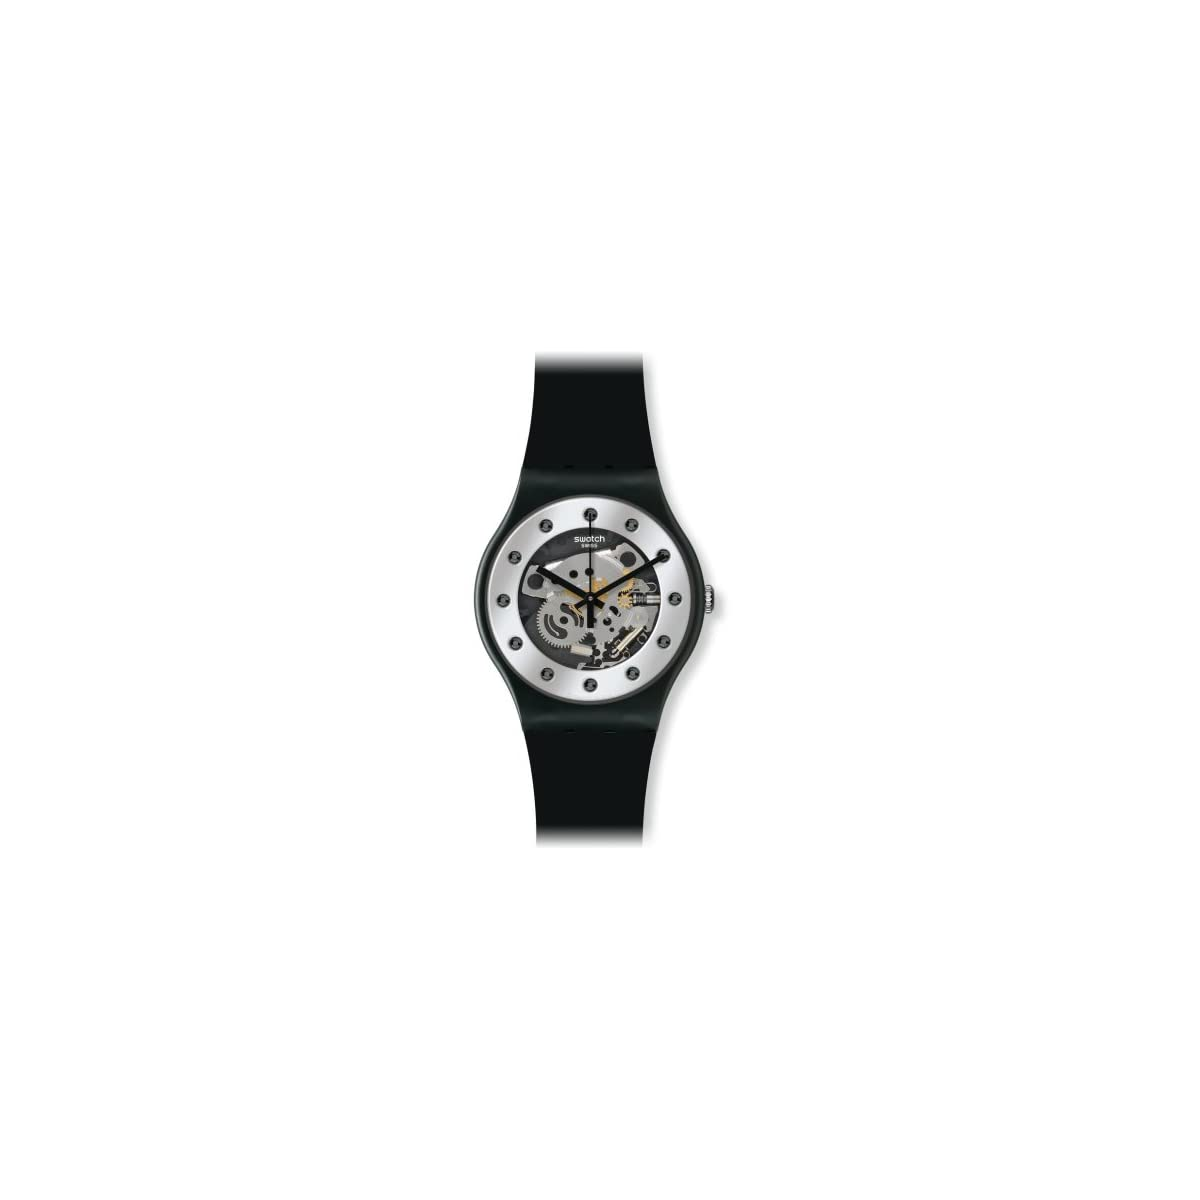 41nXGvPqD%2BL. SS1200  - Reloj Swatch - Hombre SUOZ147